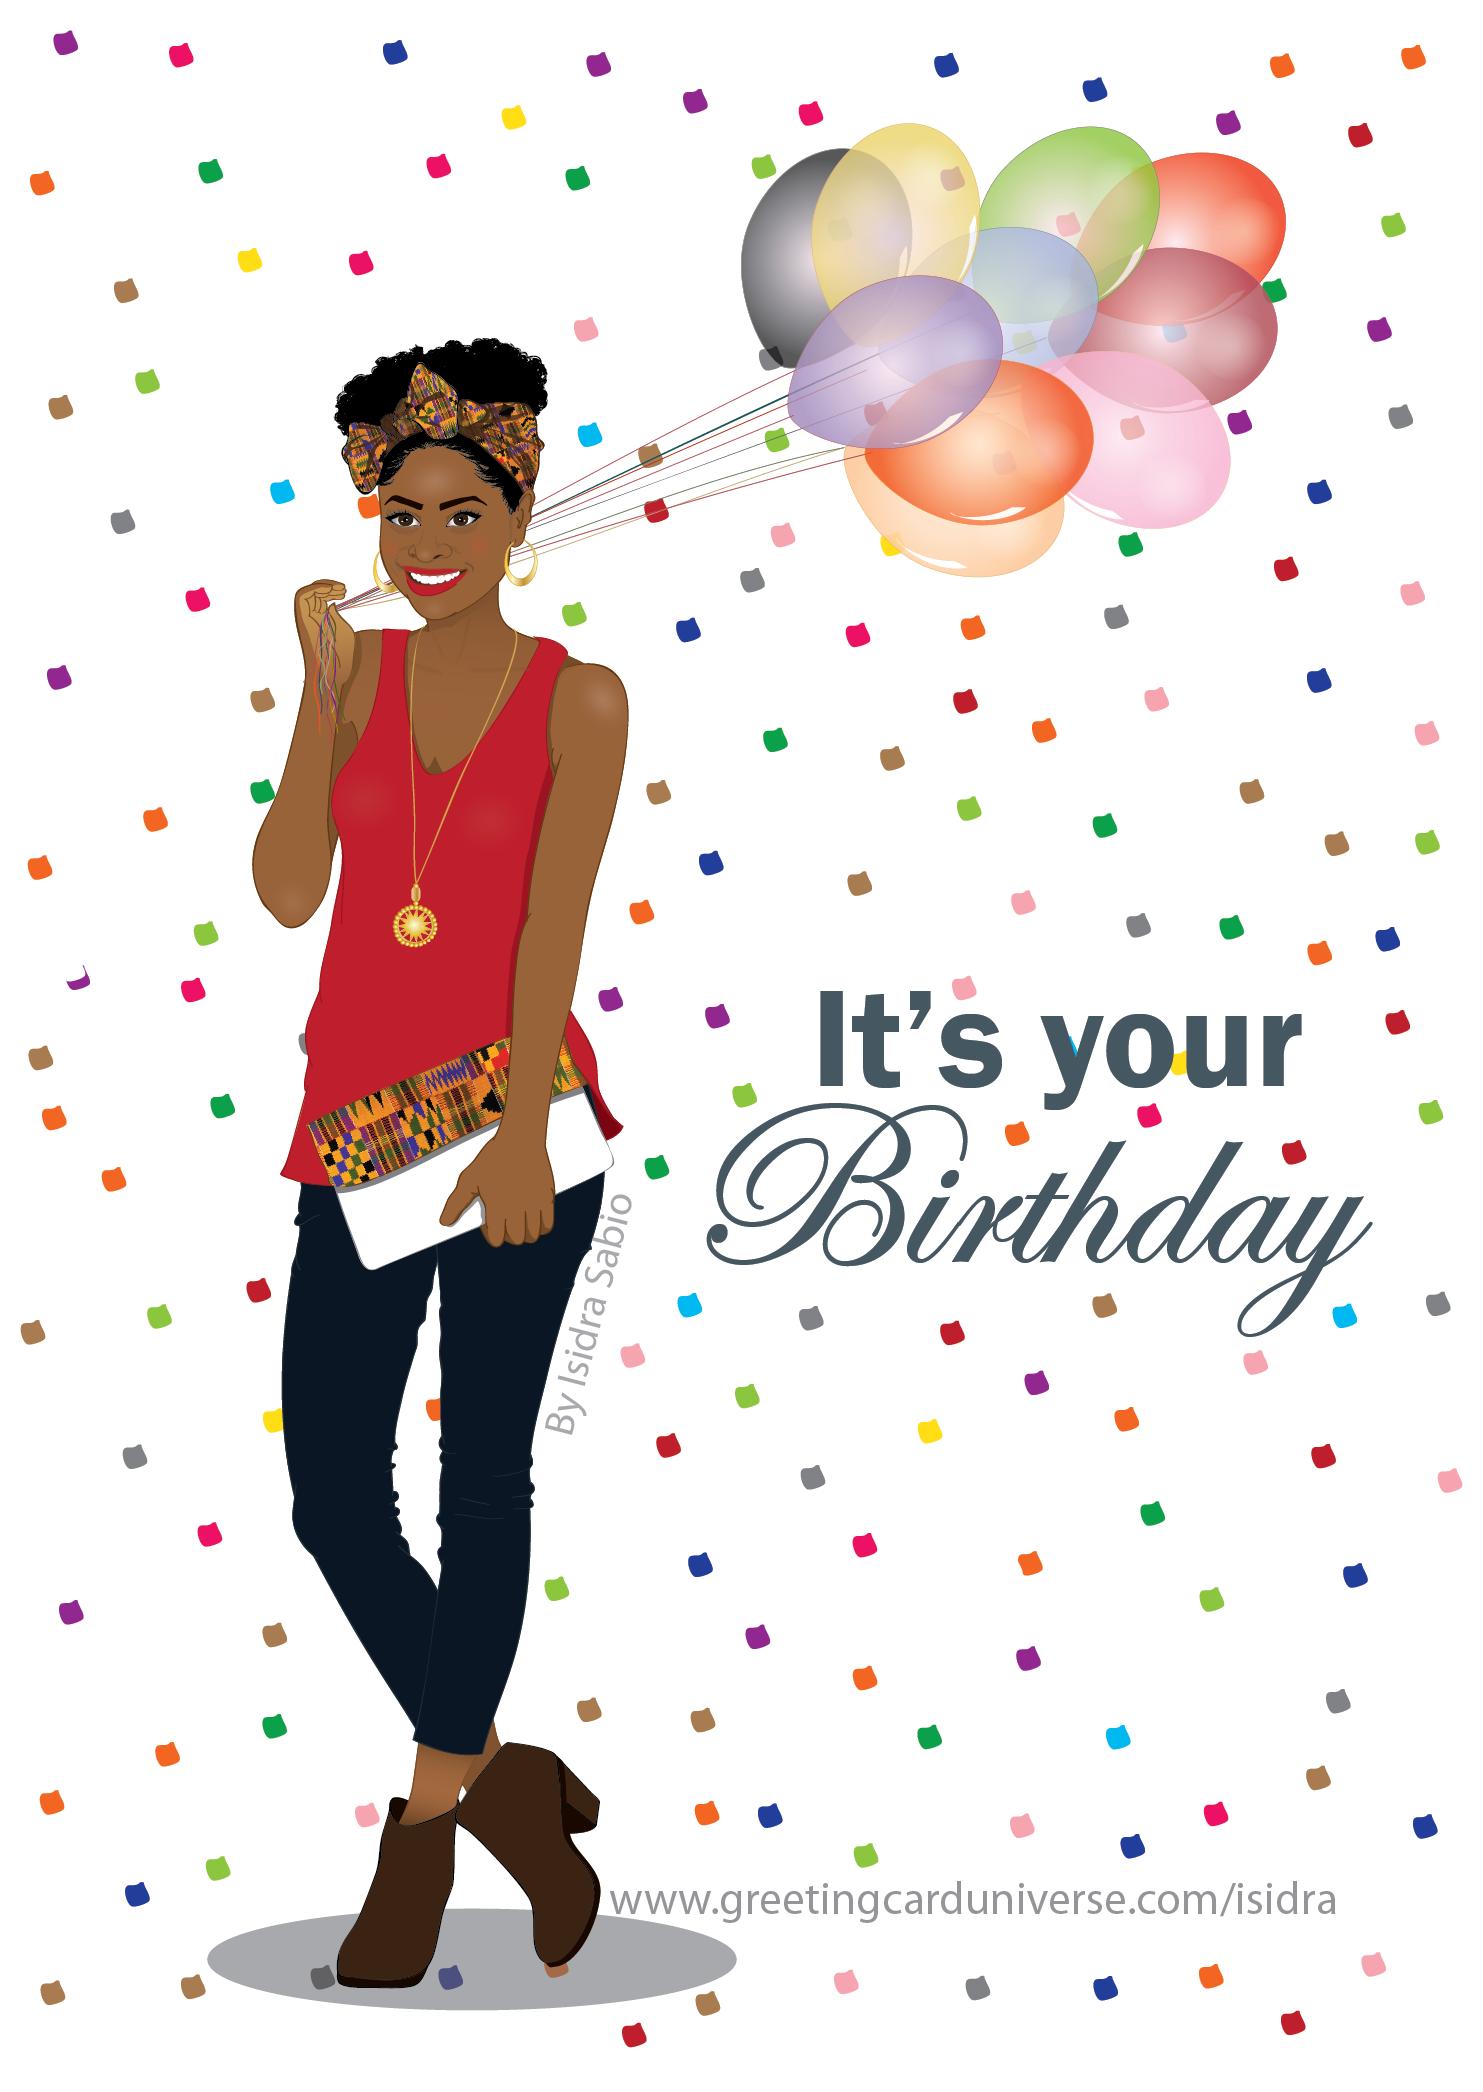 Happy Birthday Images Black Woman : happy, birthday, images, black, woman, Birthday, Cards, Created, Afro-Latin, Publishing